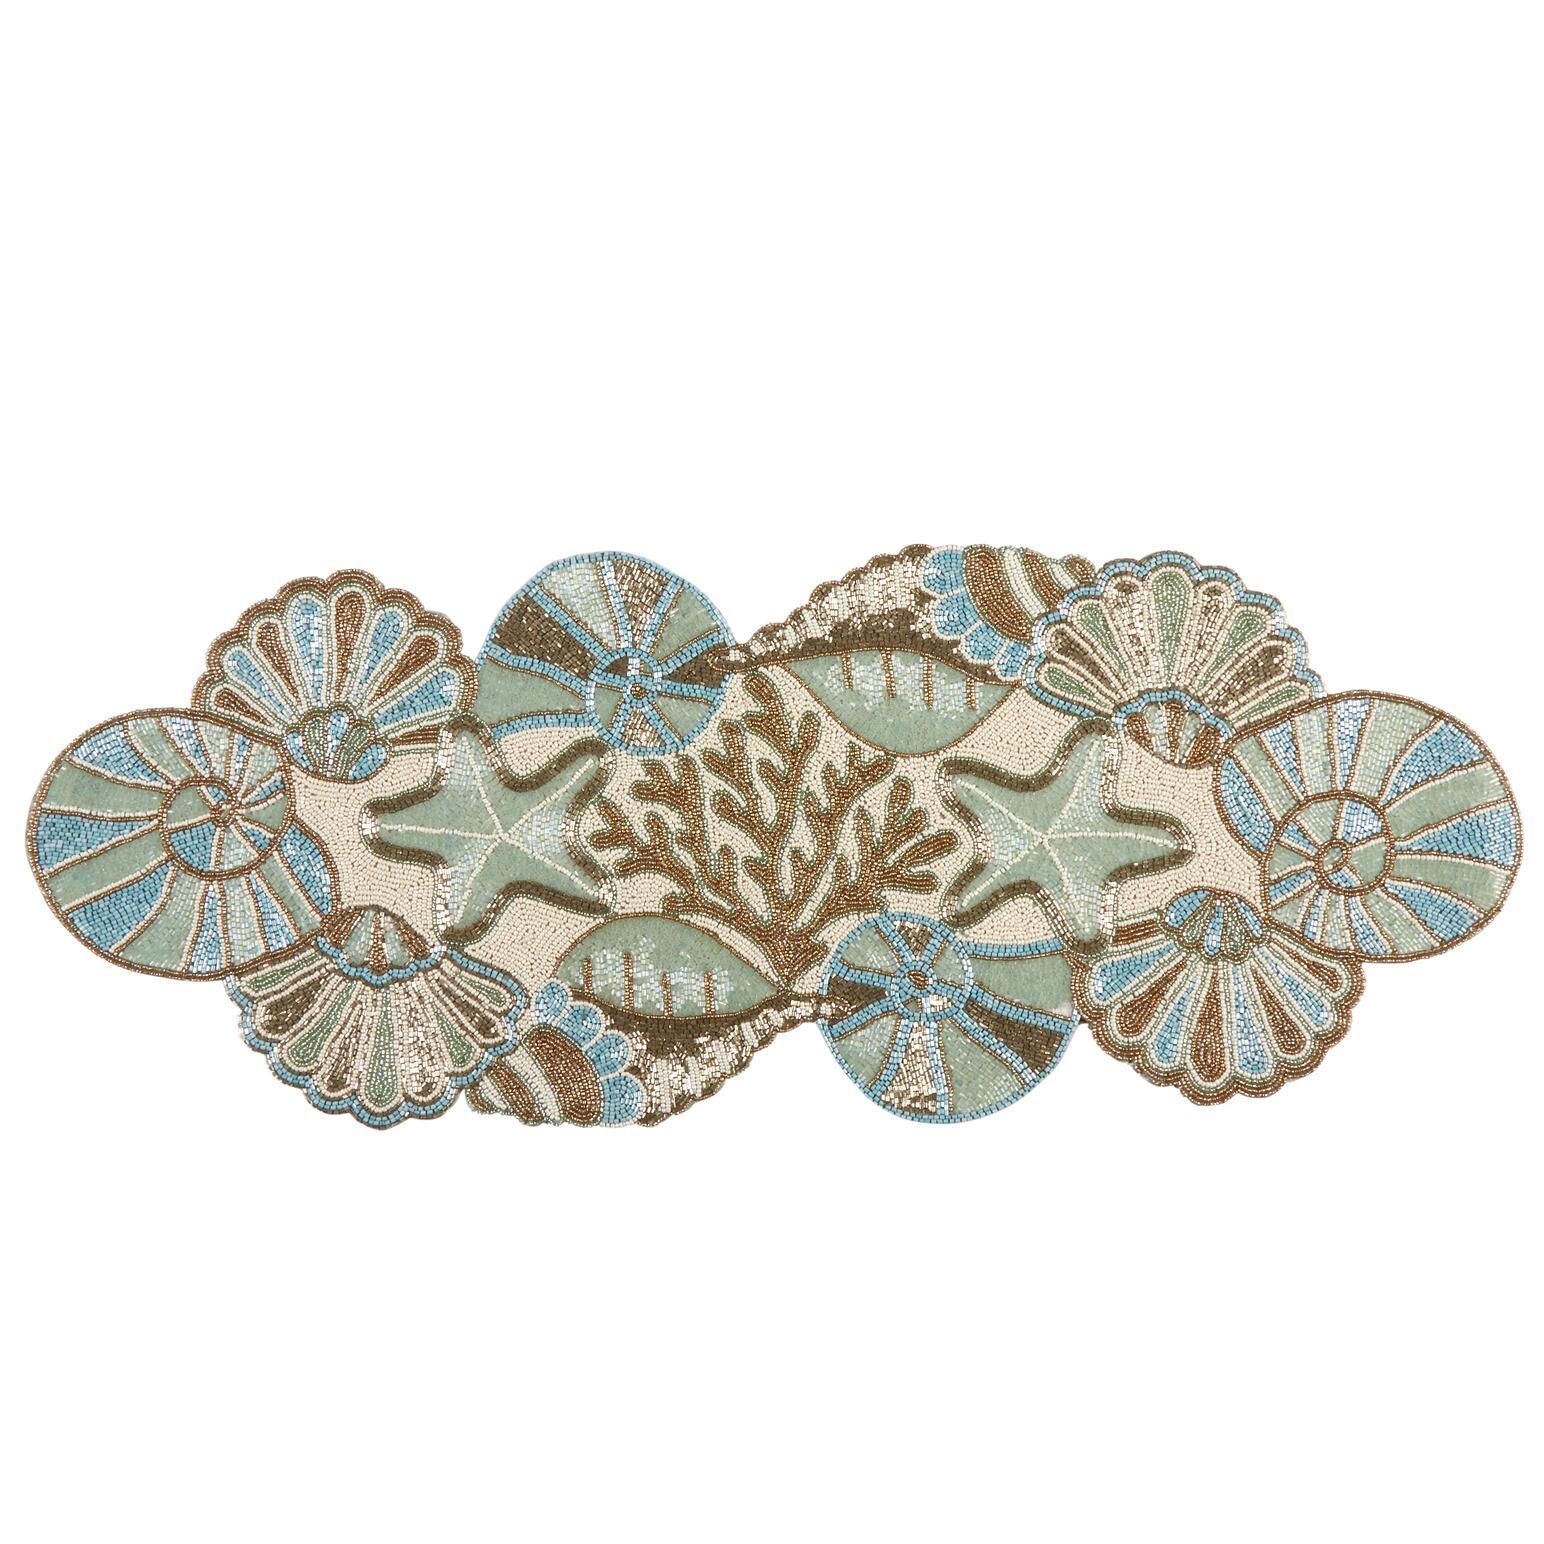 Set of 7 BlueTurquoise Crocheted Sea Shell Coasters